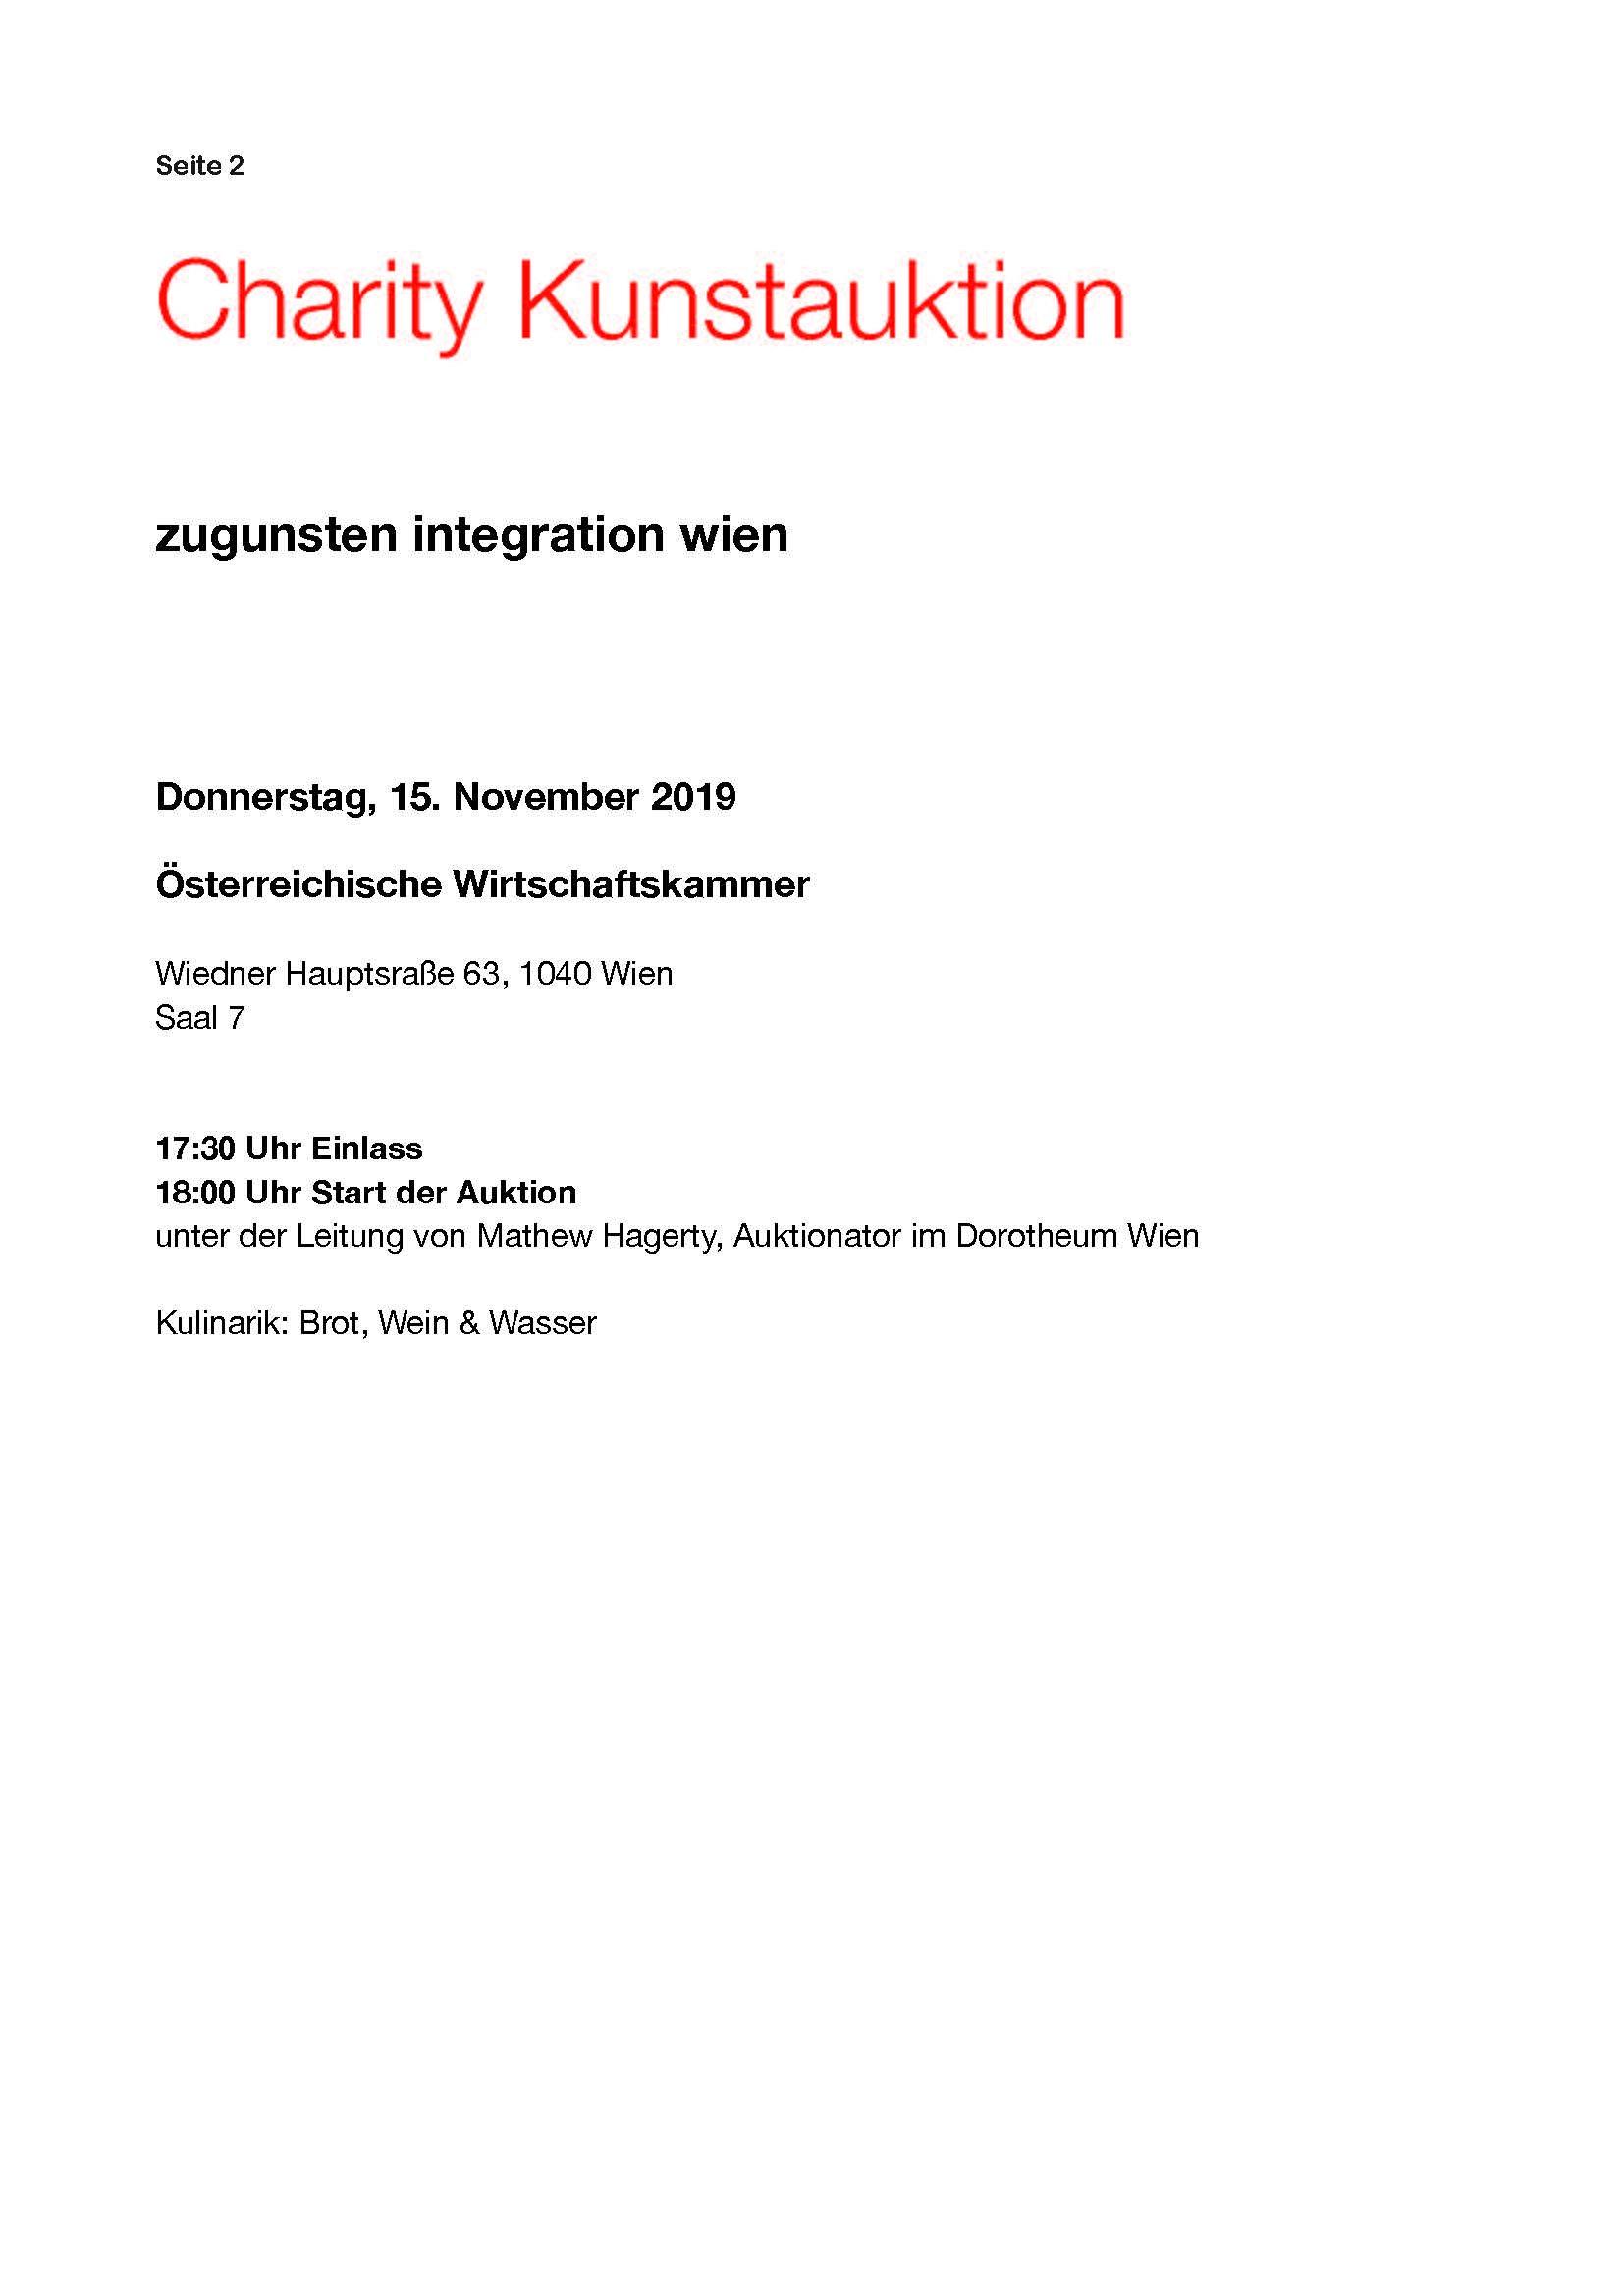 kunstauktion_folder-2019-web_Seite_02.jpg